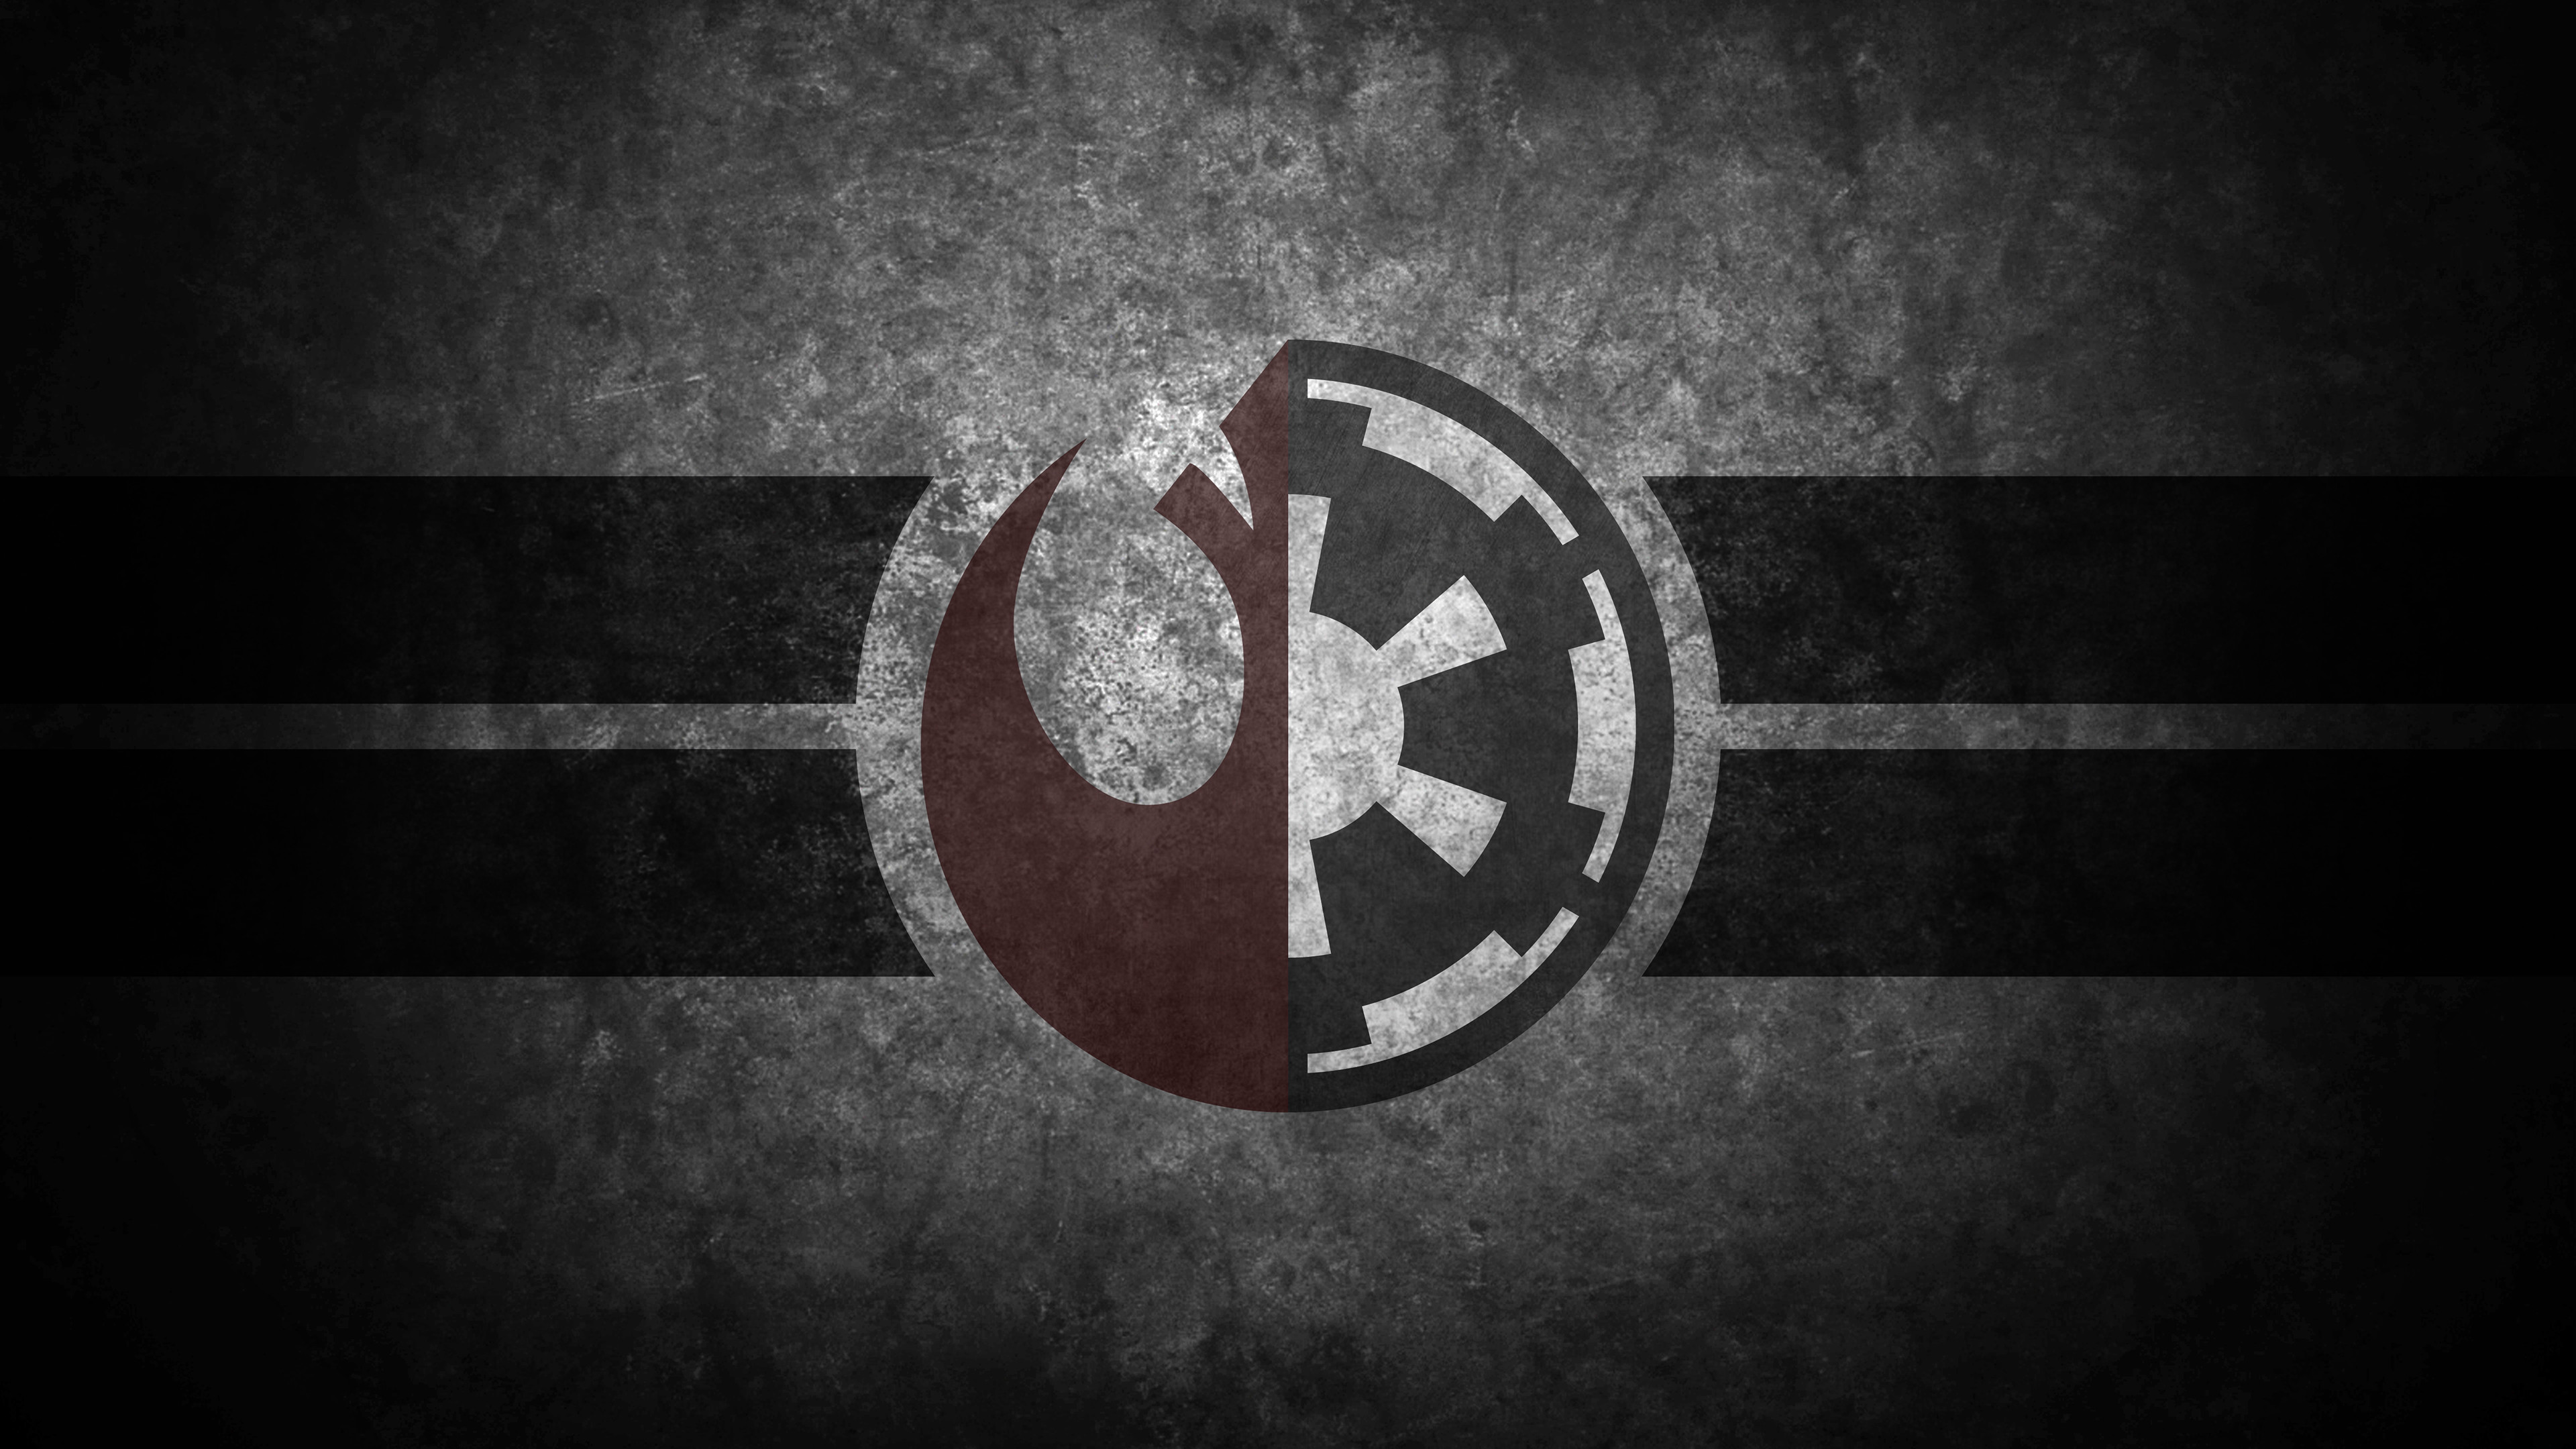 Star Wars Rebels Wallpapers 86 Images